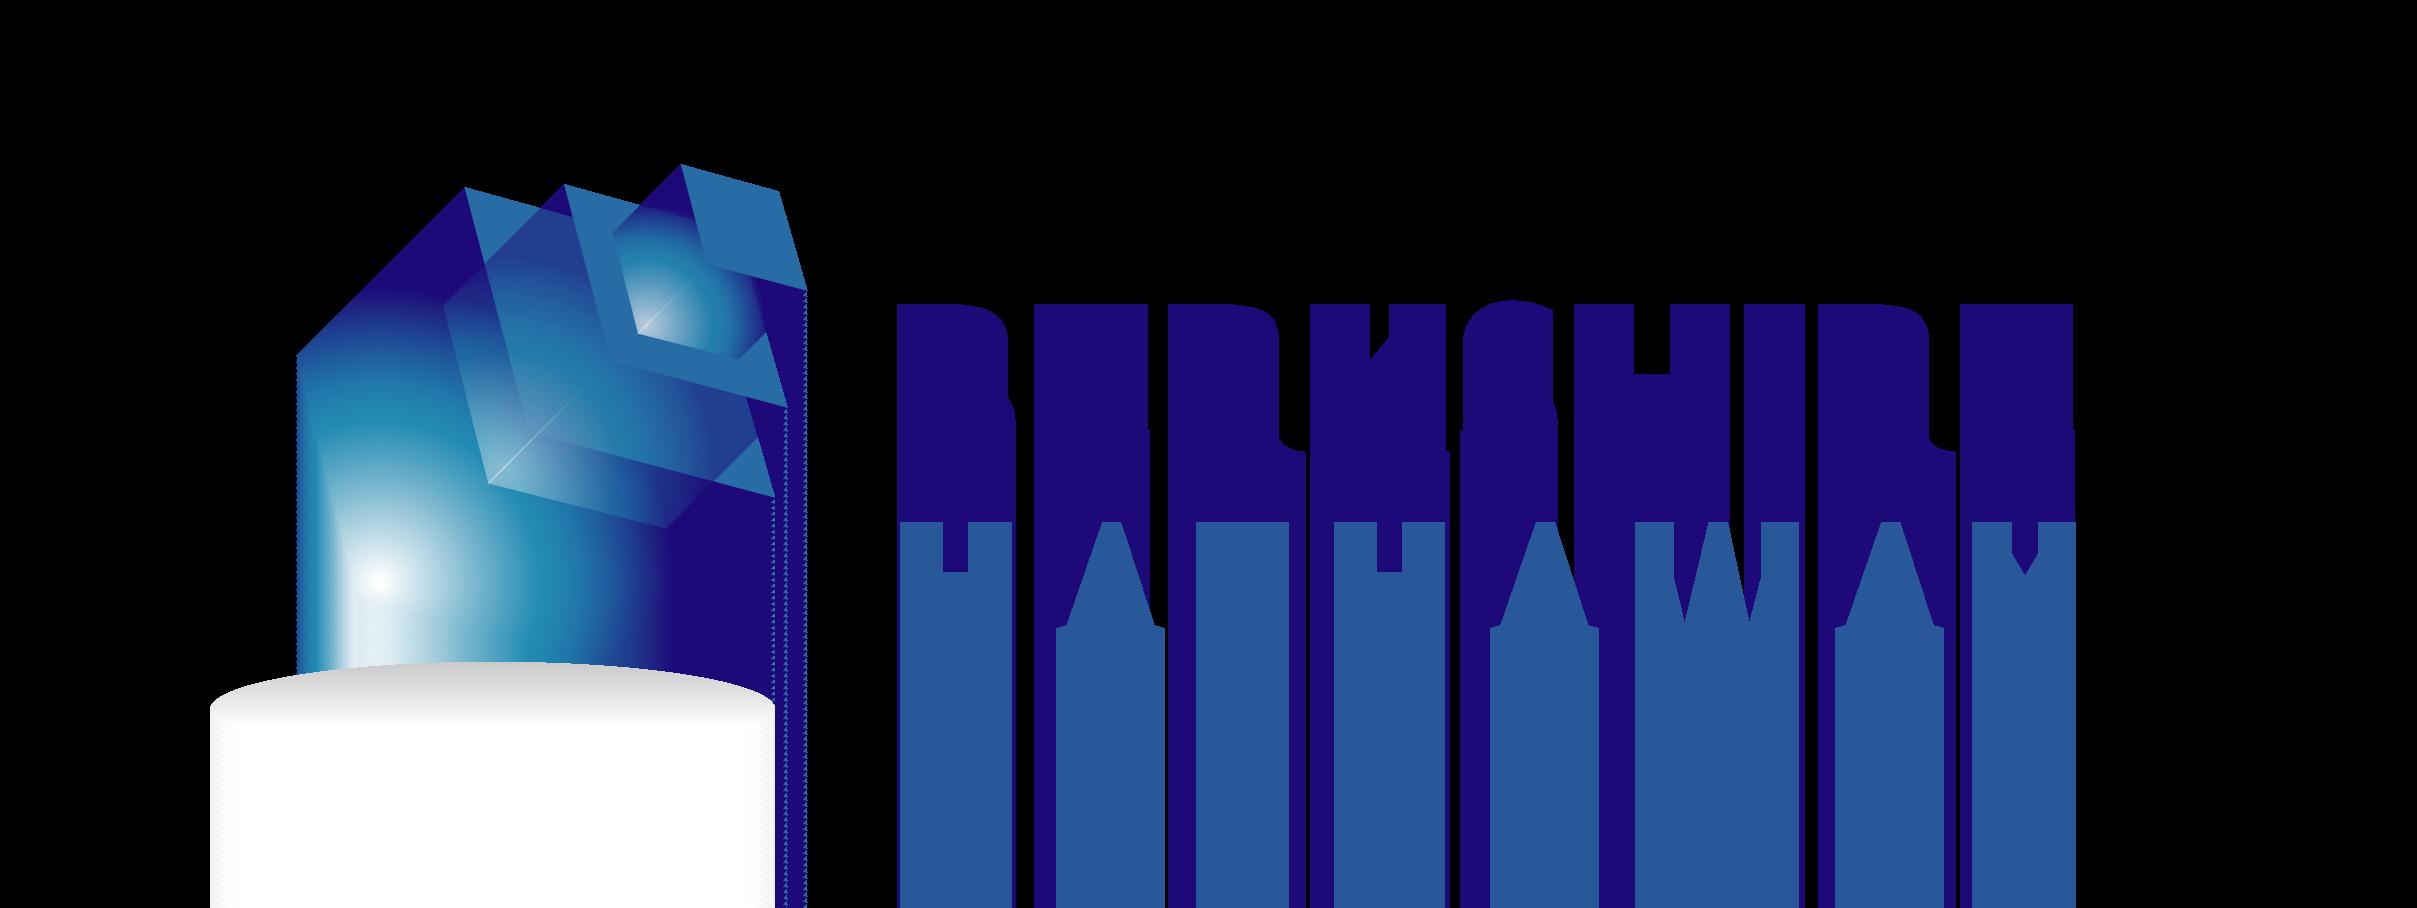 Berkshire Hathaway BRK.A logo